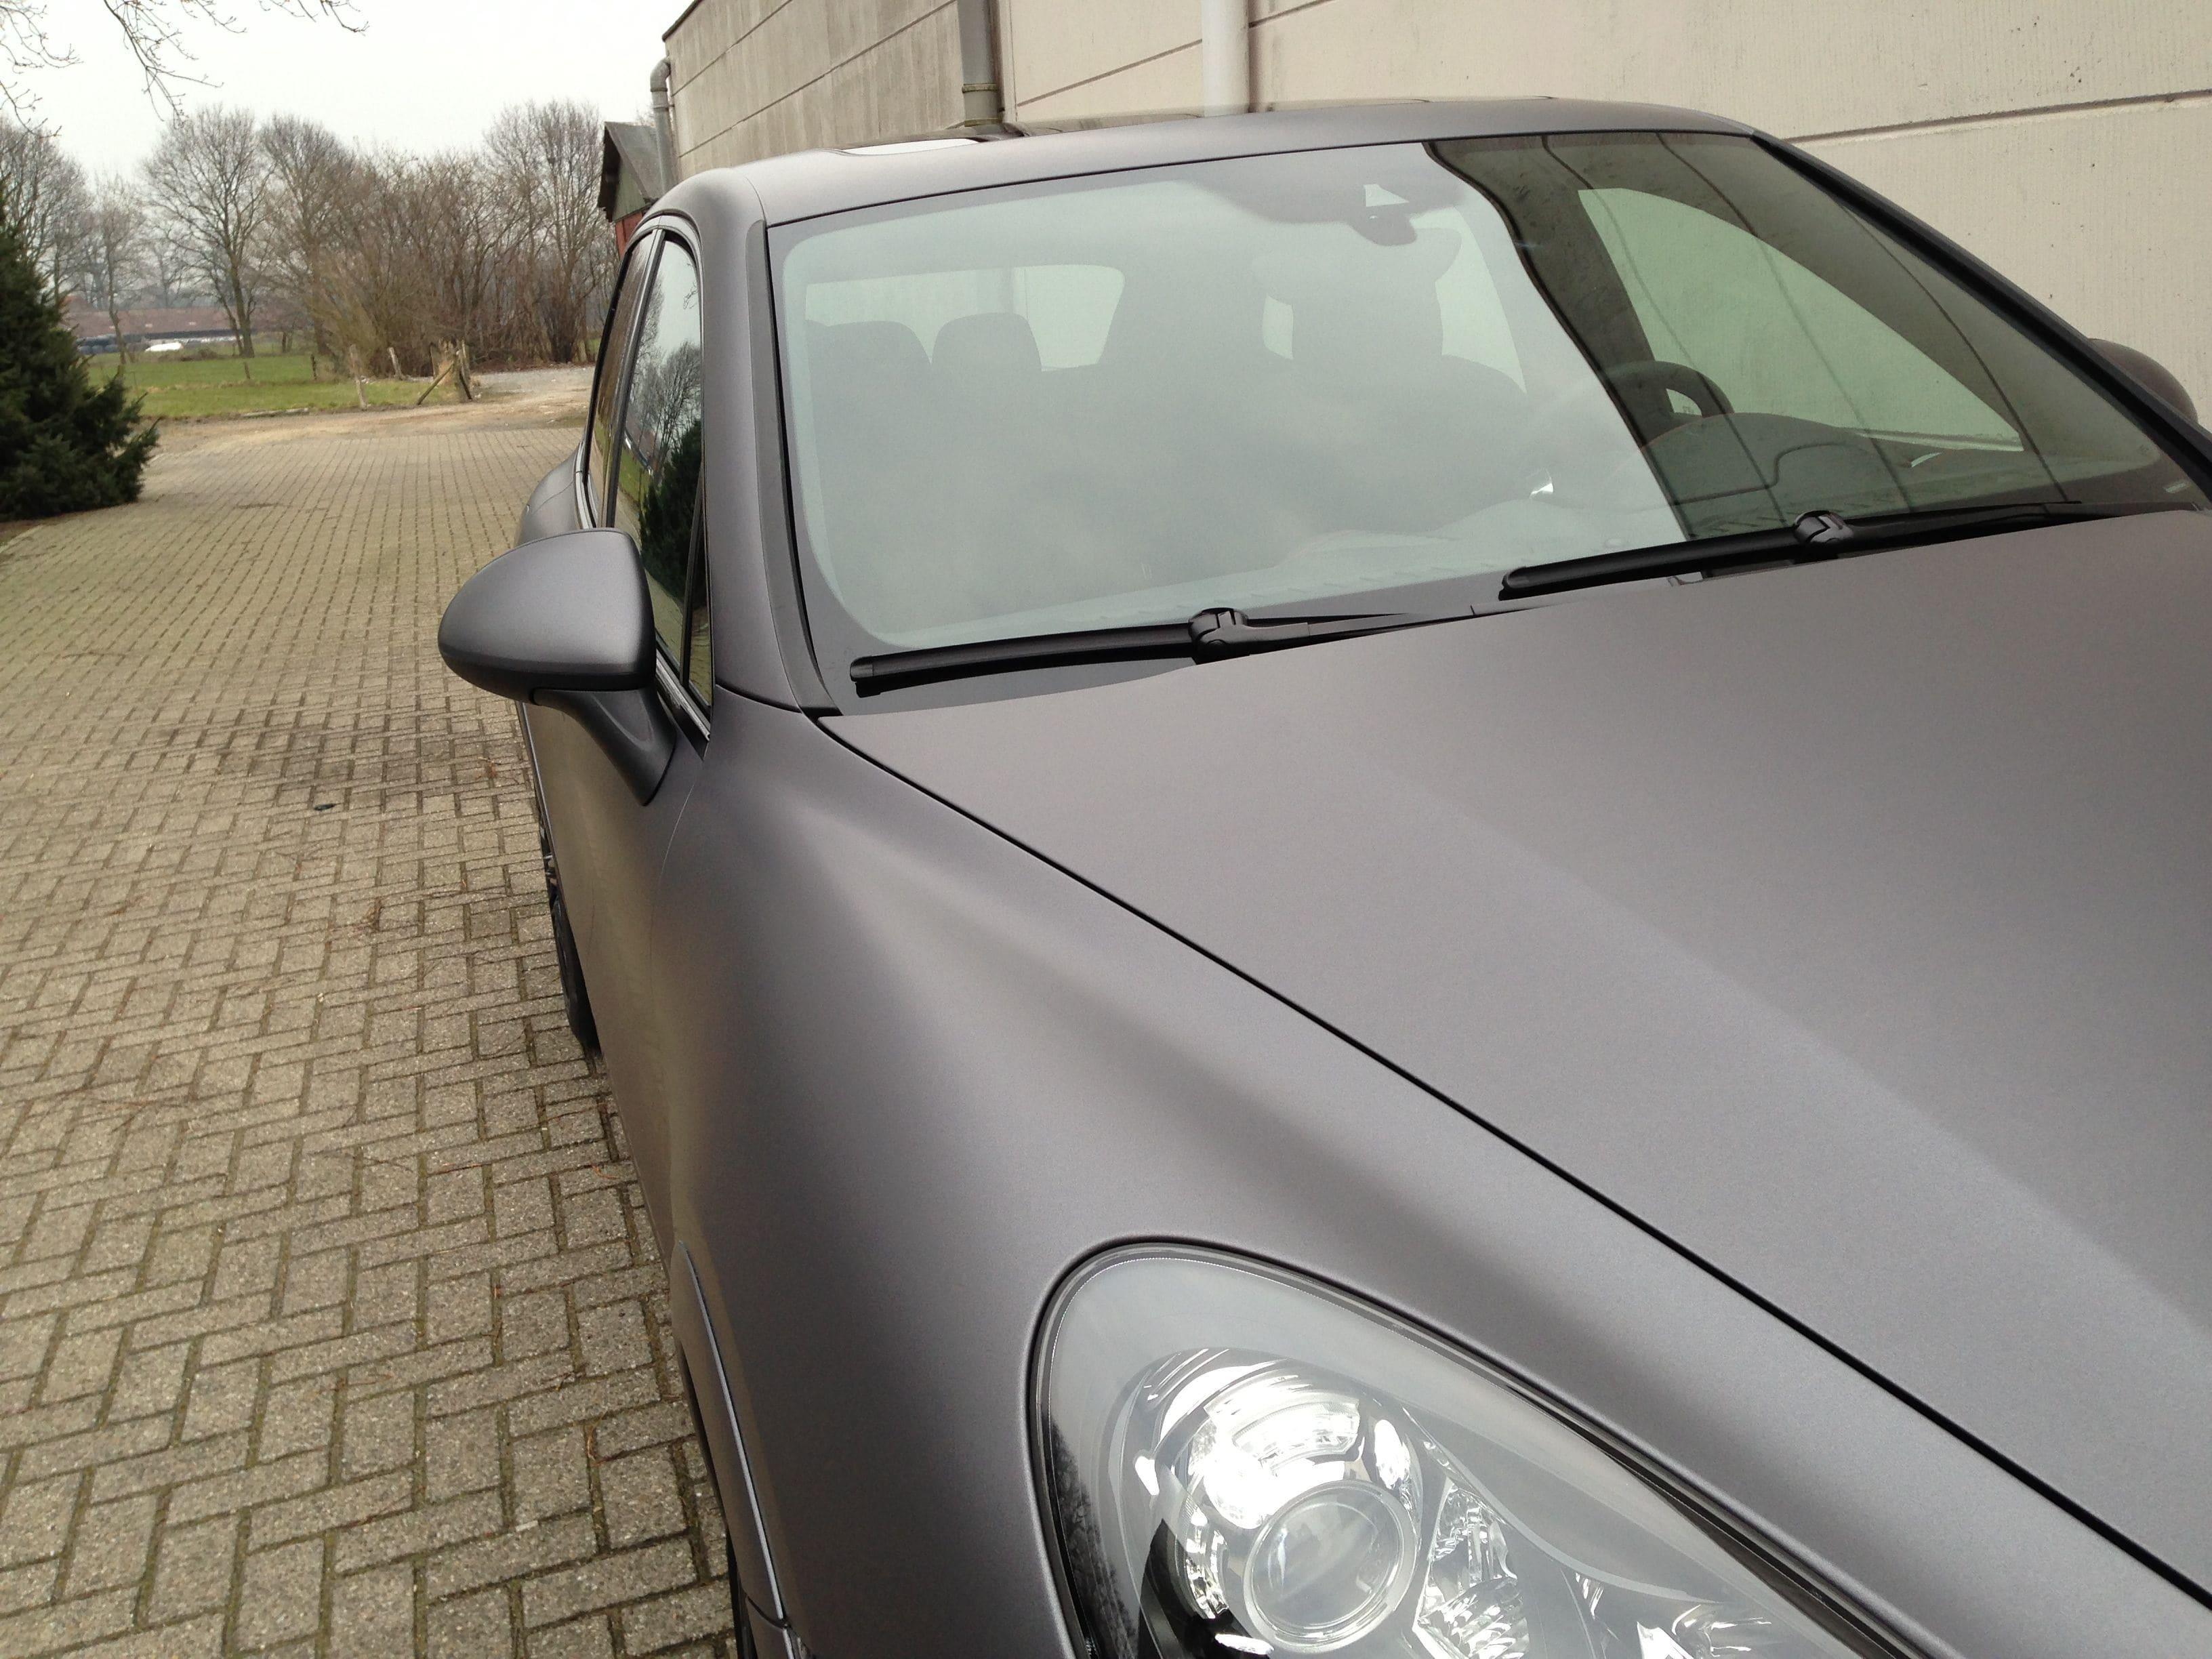 Porsche Cayenne GTS met Gunpowder Wrap, Carwrapping door Wrapmyride.nu Foto-nr:6769, ©2021